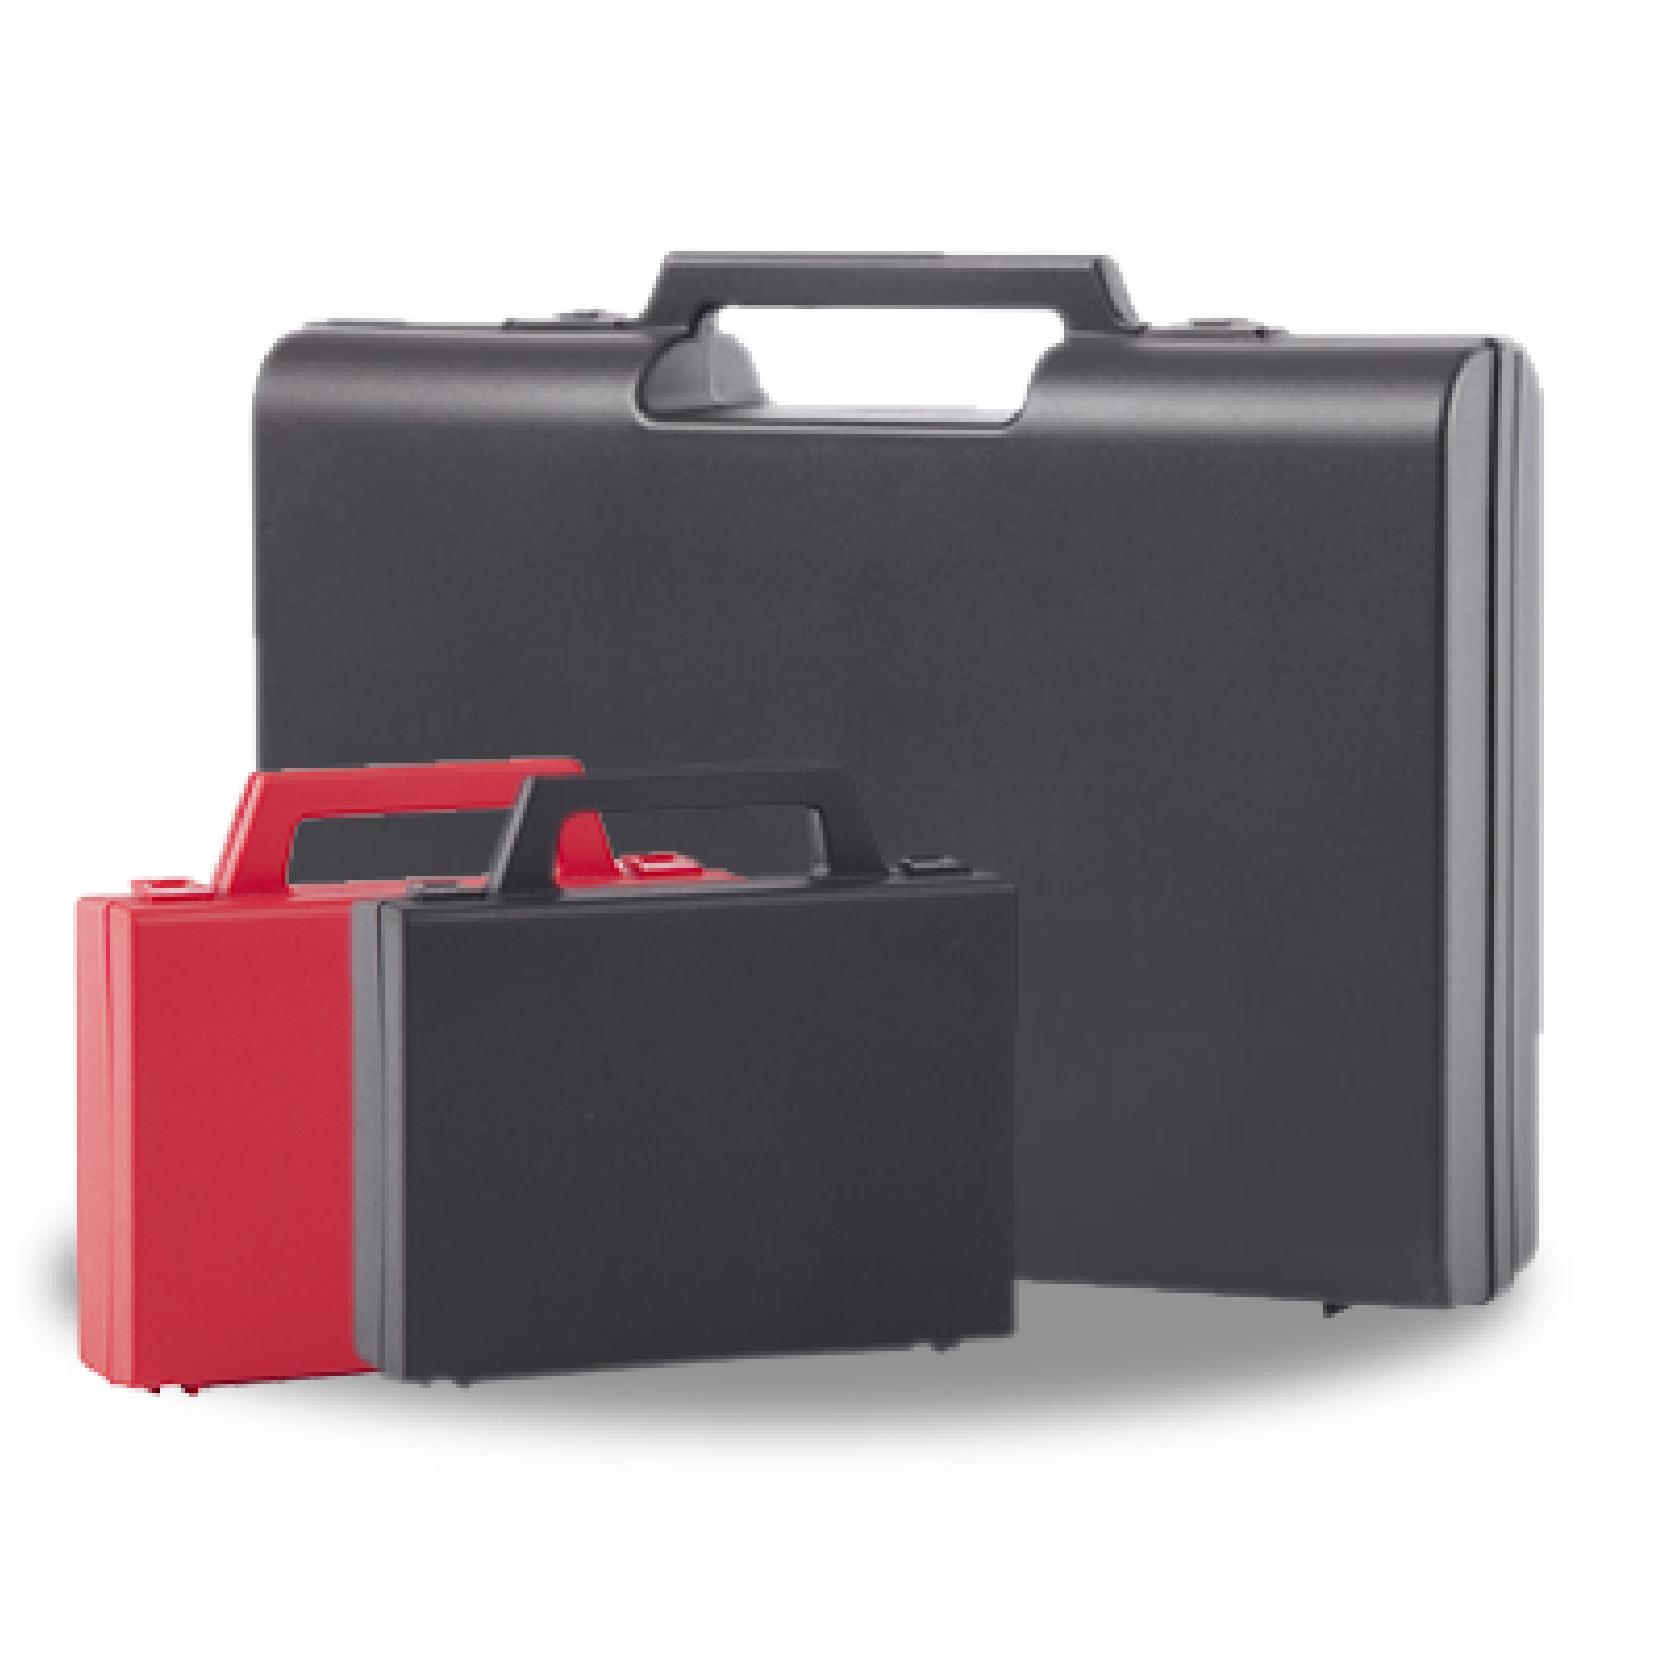 gaggione eplasticase fabricant valise technique mallettes - boxes cases manufacturer